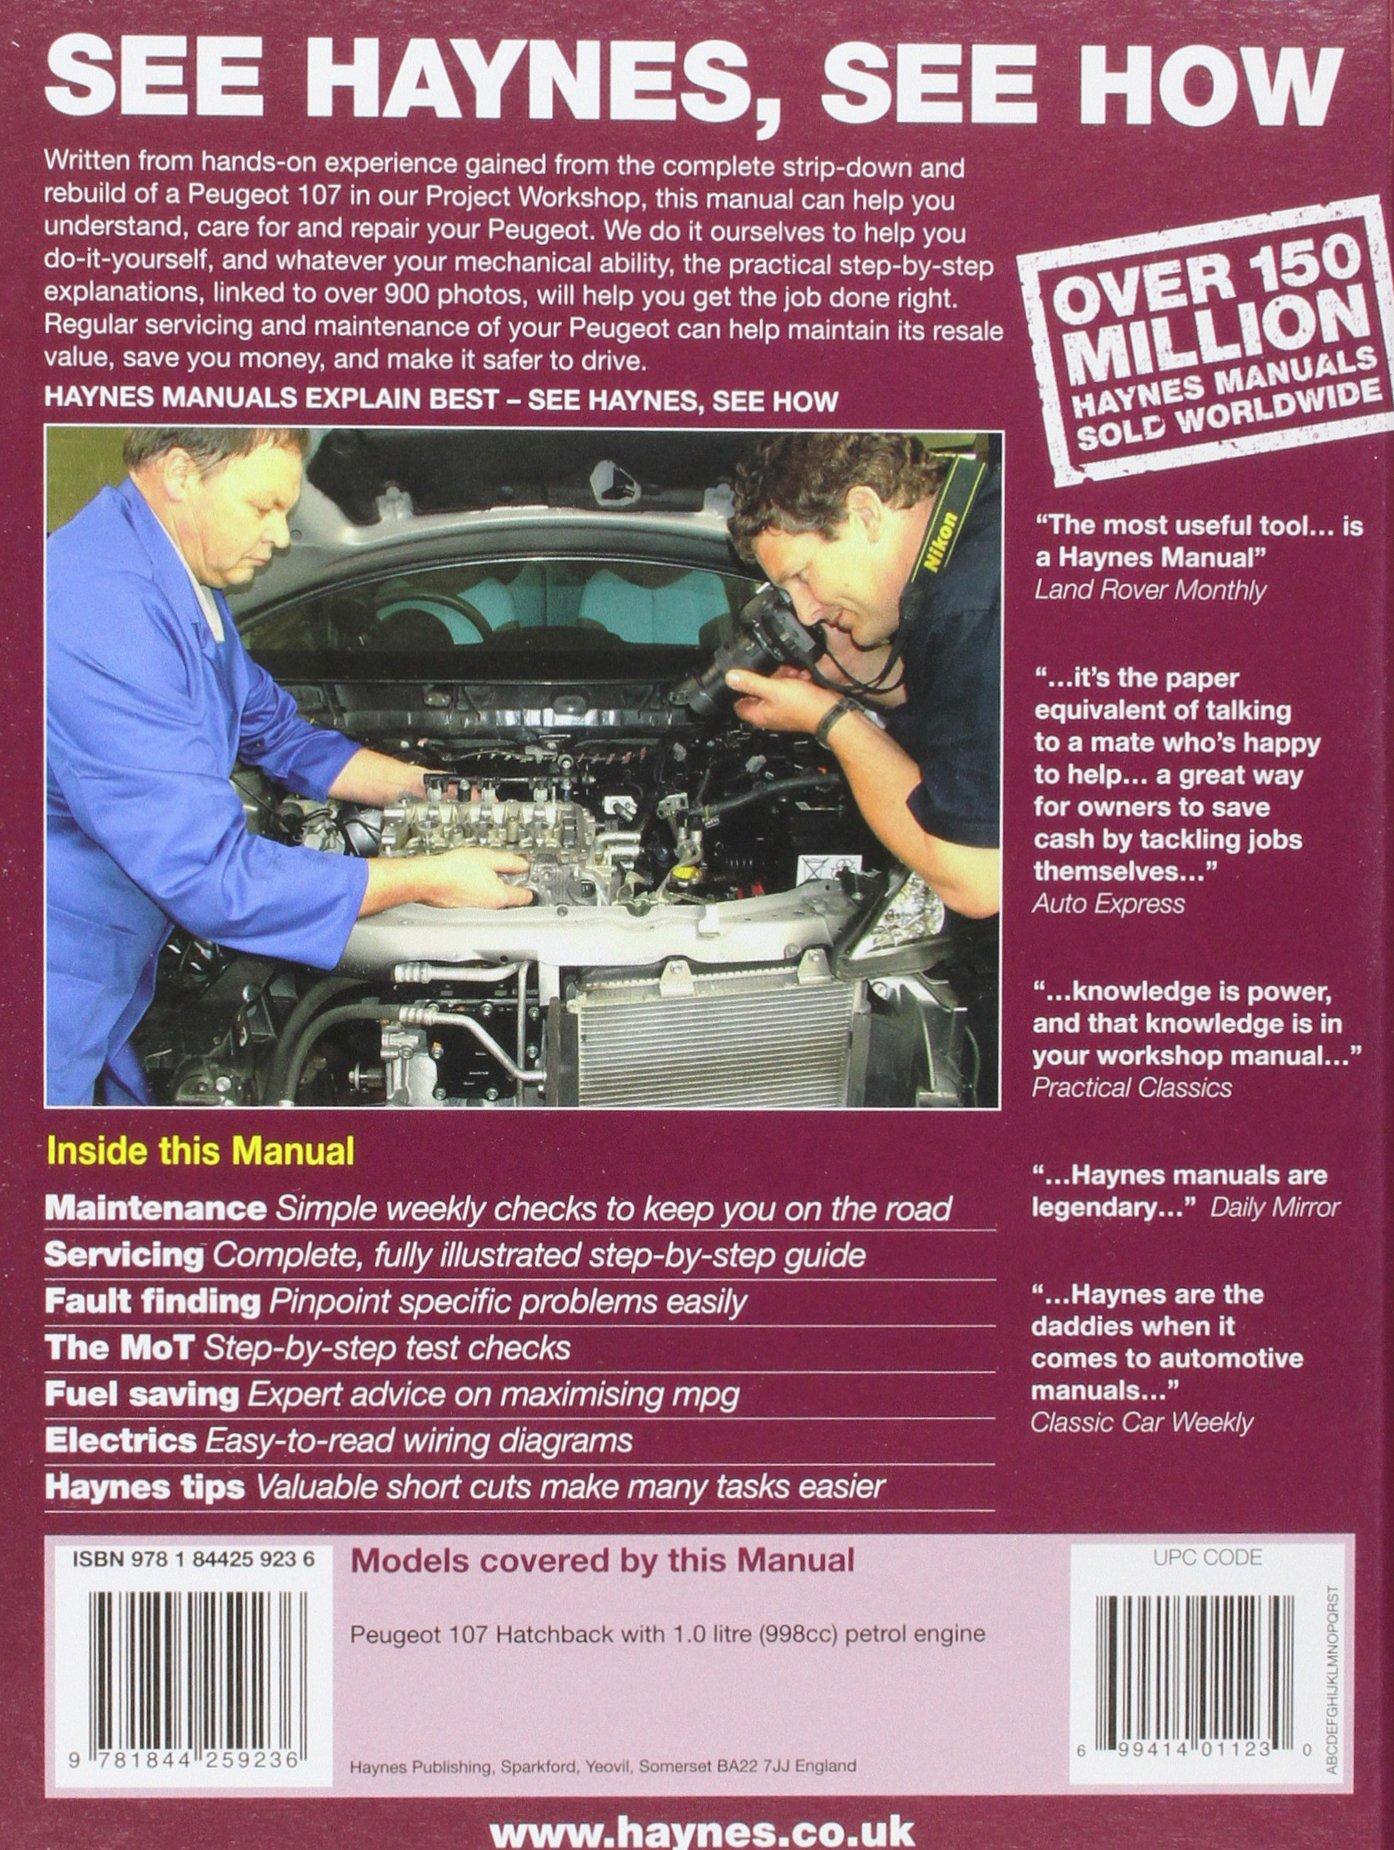 Peugeot 107 Petrol (05 - 11) Haynes Repair Manual: Amazon.co.uk: Anon:  9781844259236: Books